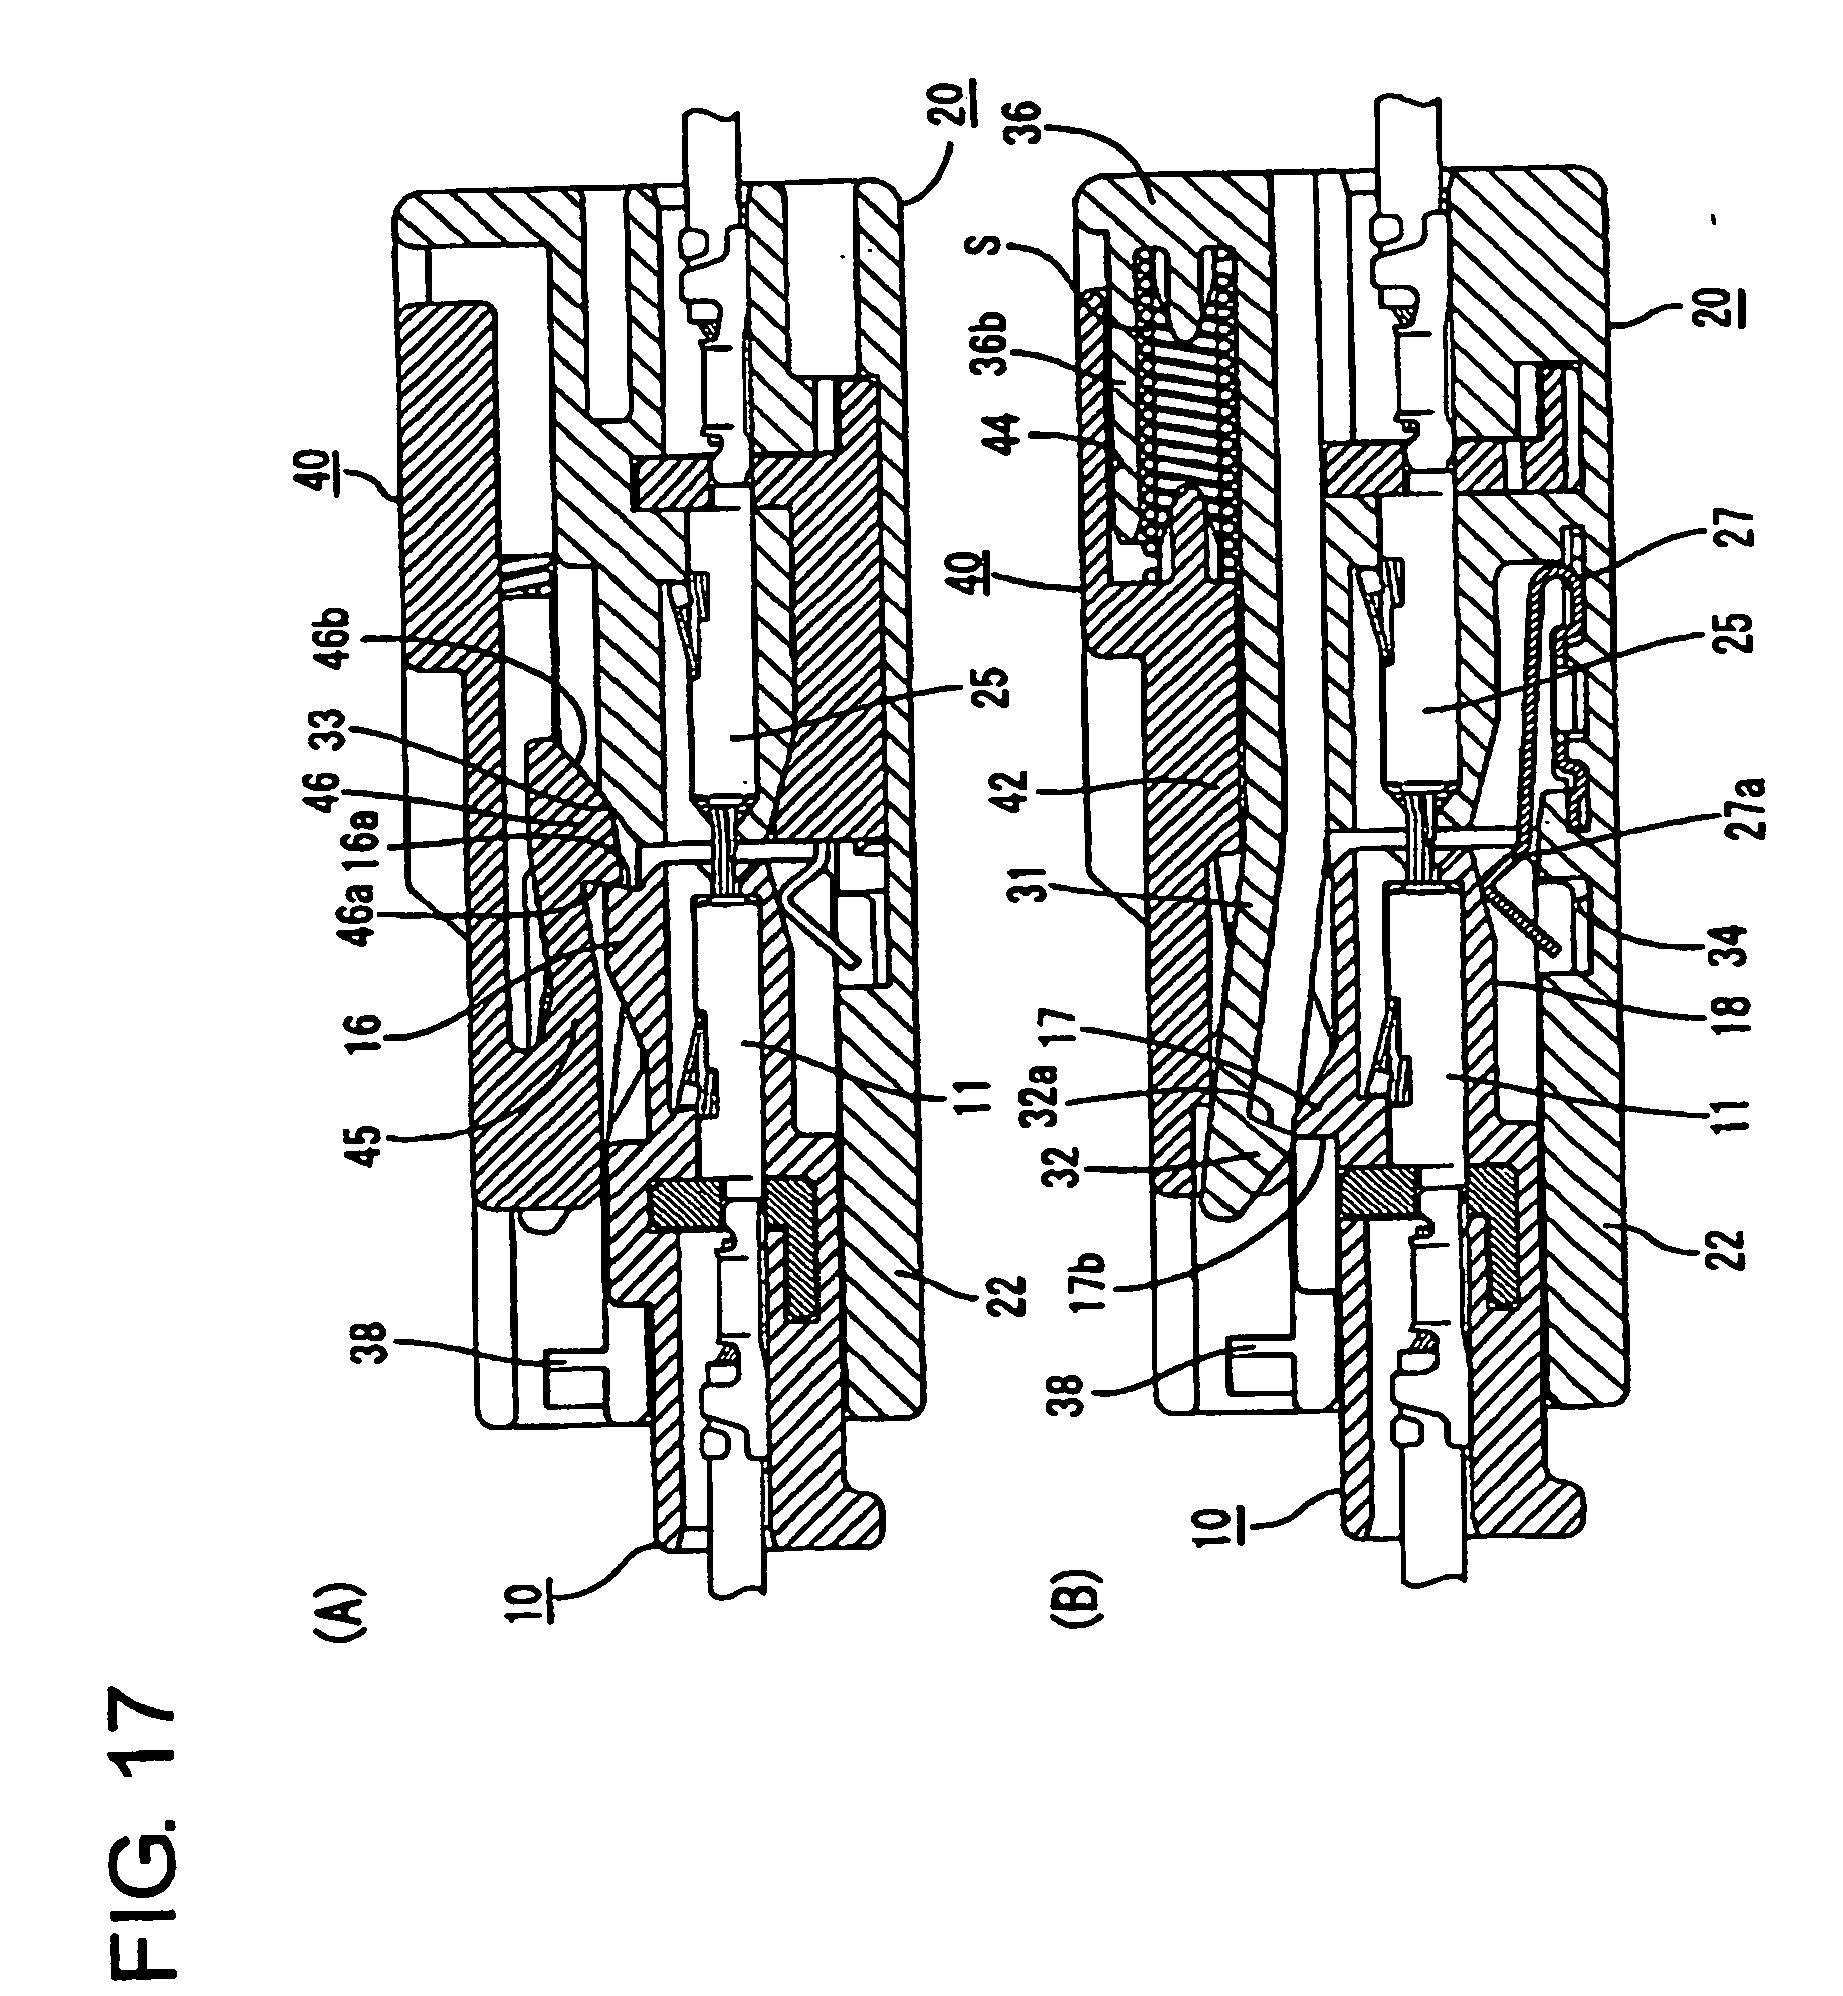 patent ep1523072b1